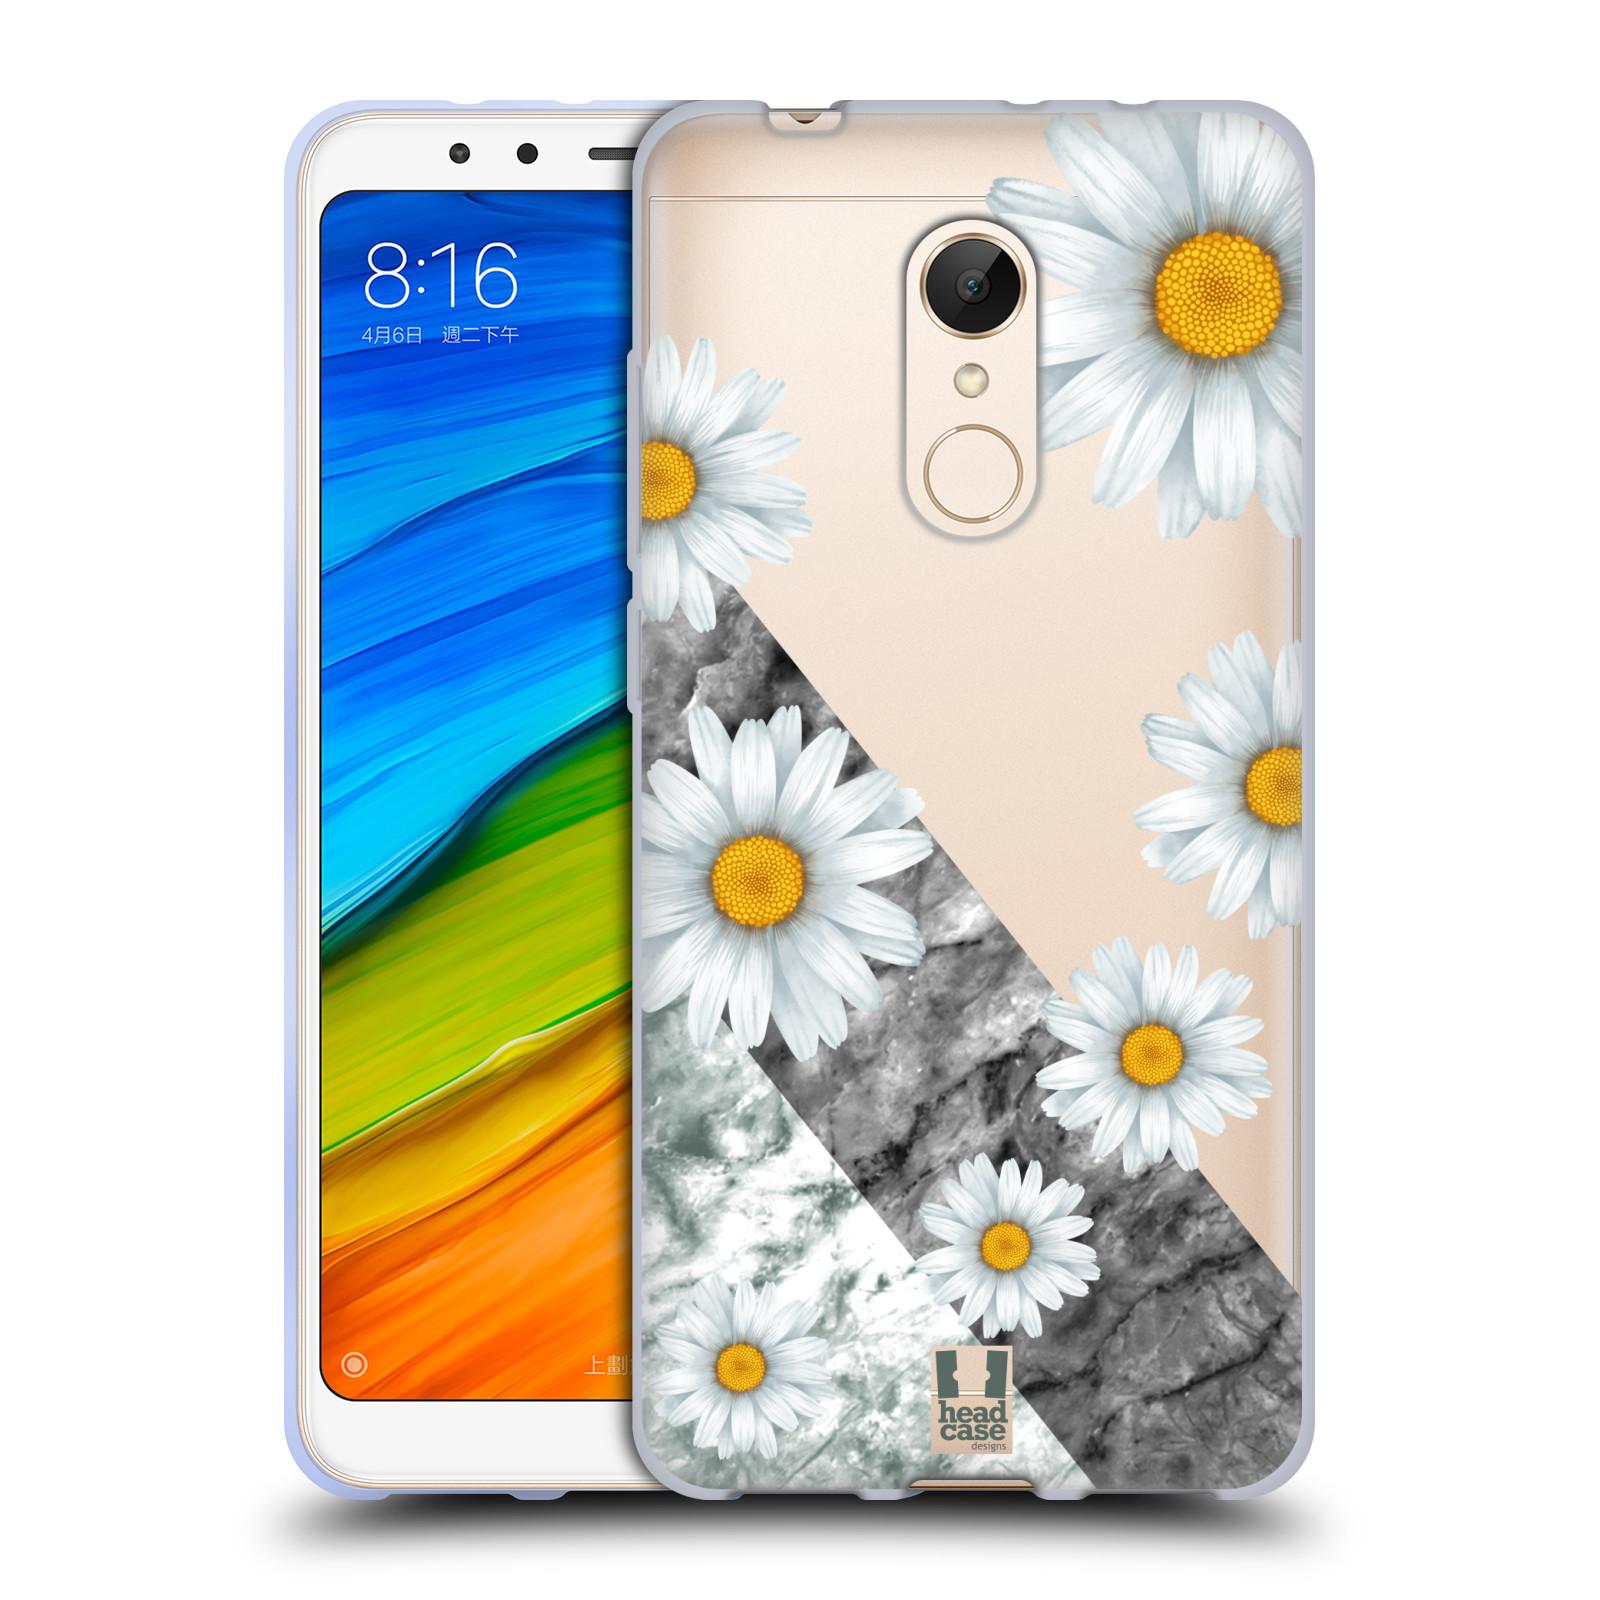 Silikonové pouzdro na mobil Xiaomi Redmi 5 - Head Case - Kopretiny a mramor